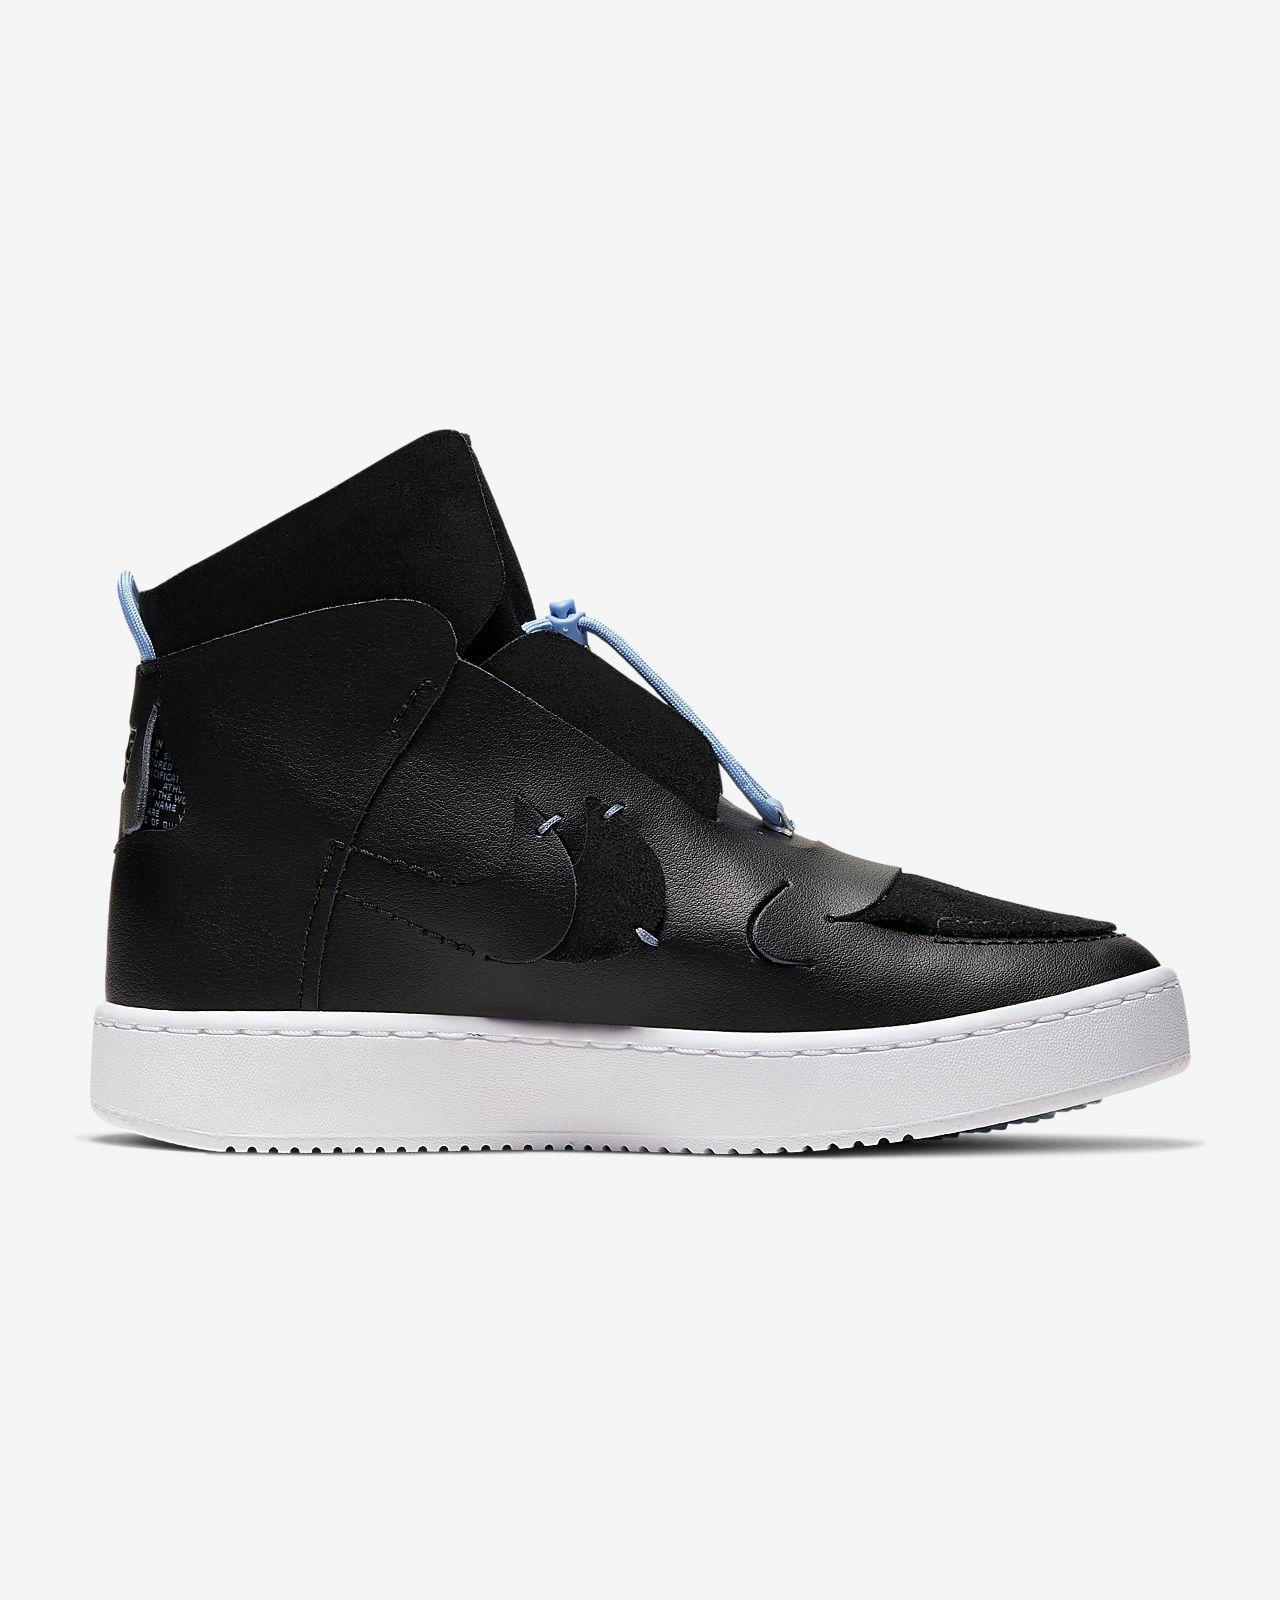 nike vandal low wmns black want them baaaaaack!! | Nike